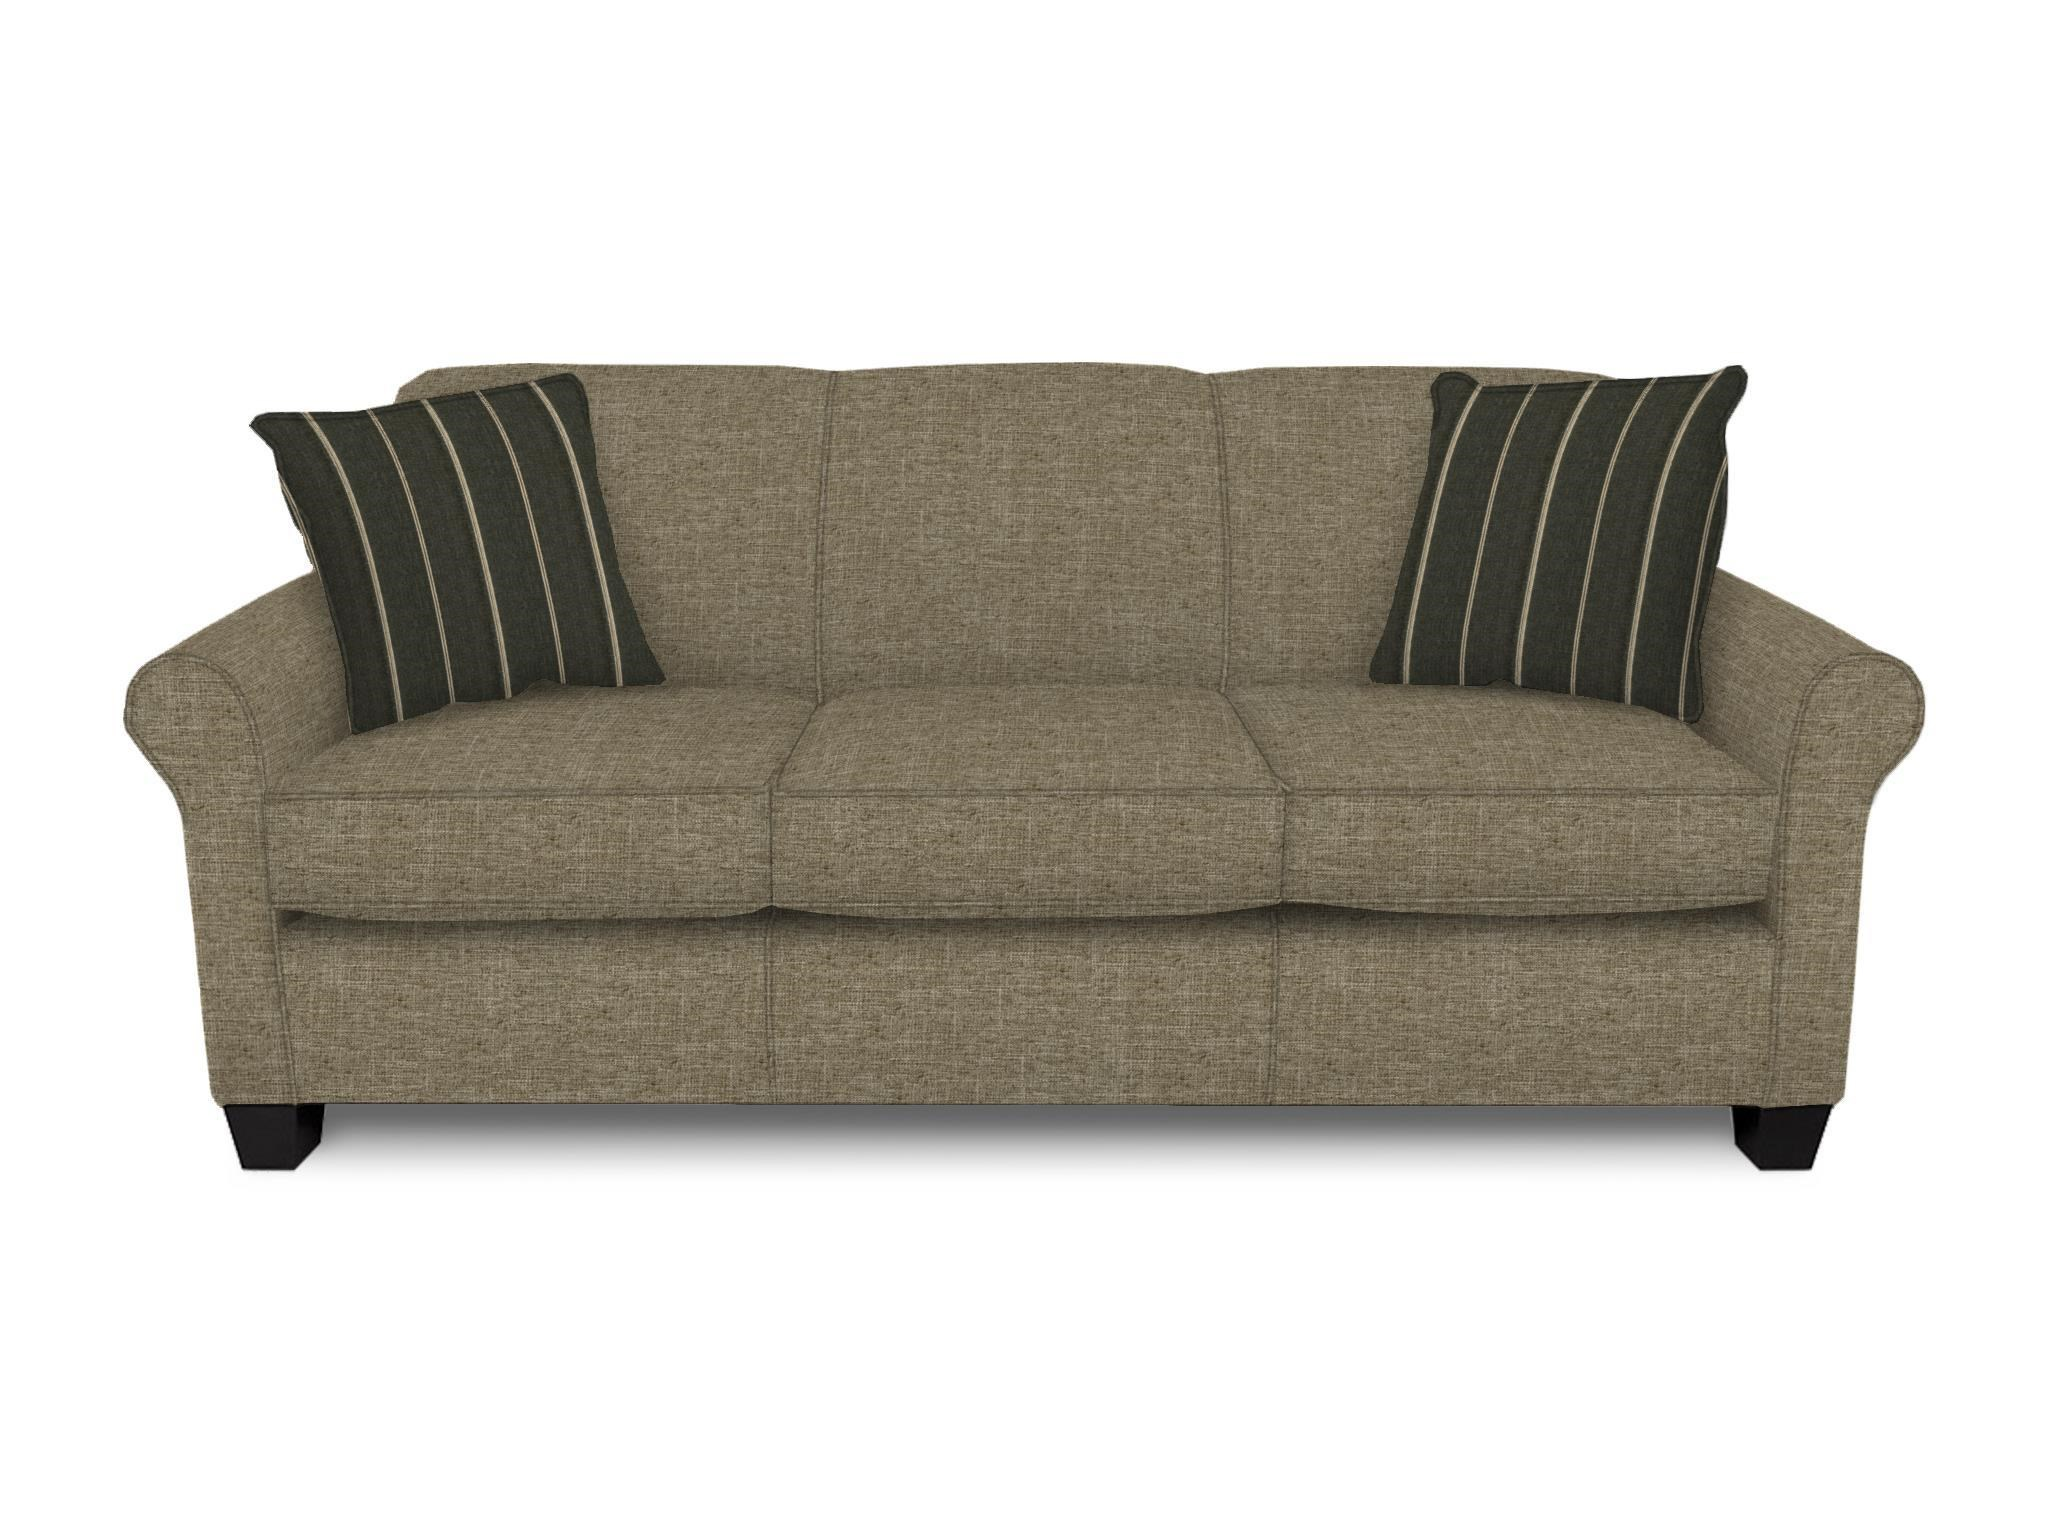 England Angie Sofa - Item Number: 4635 Sofa